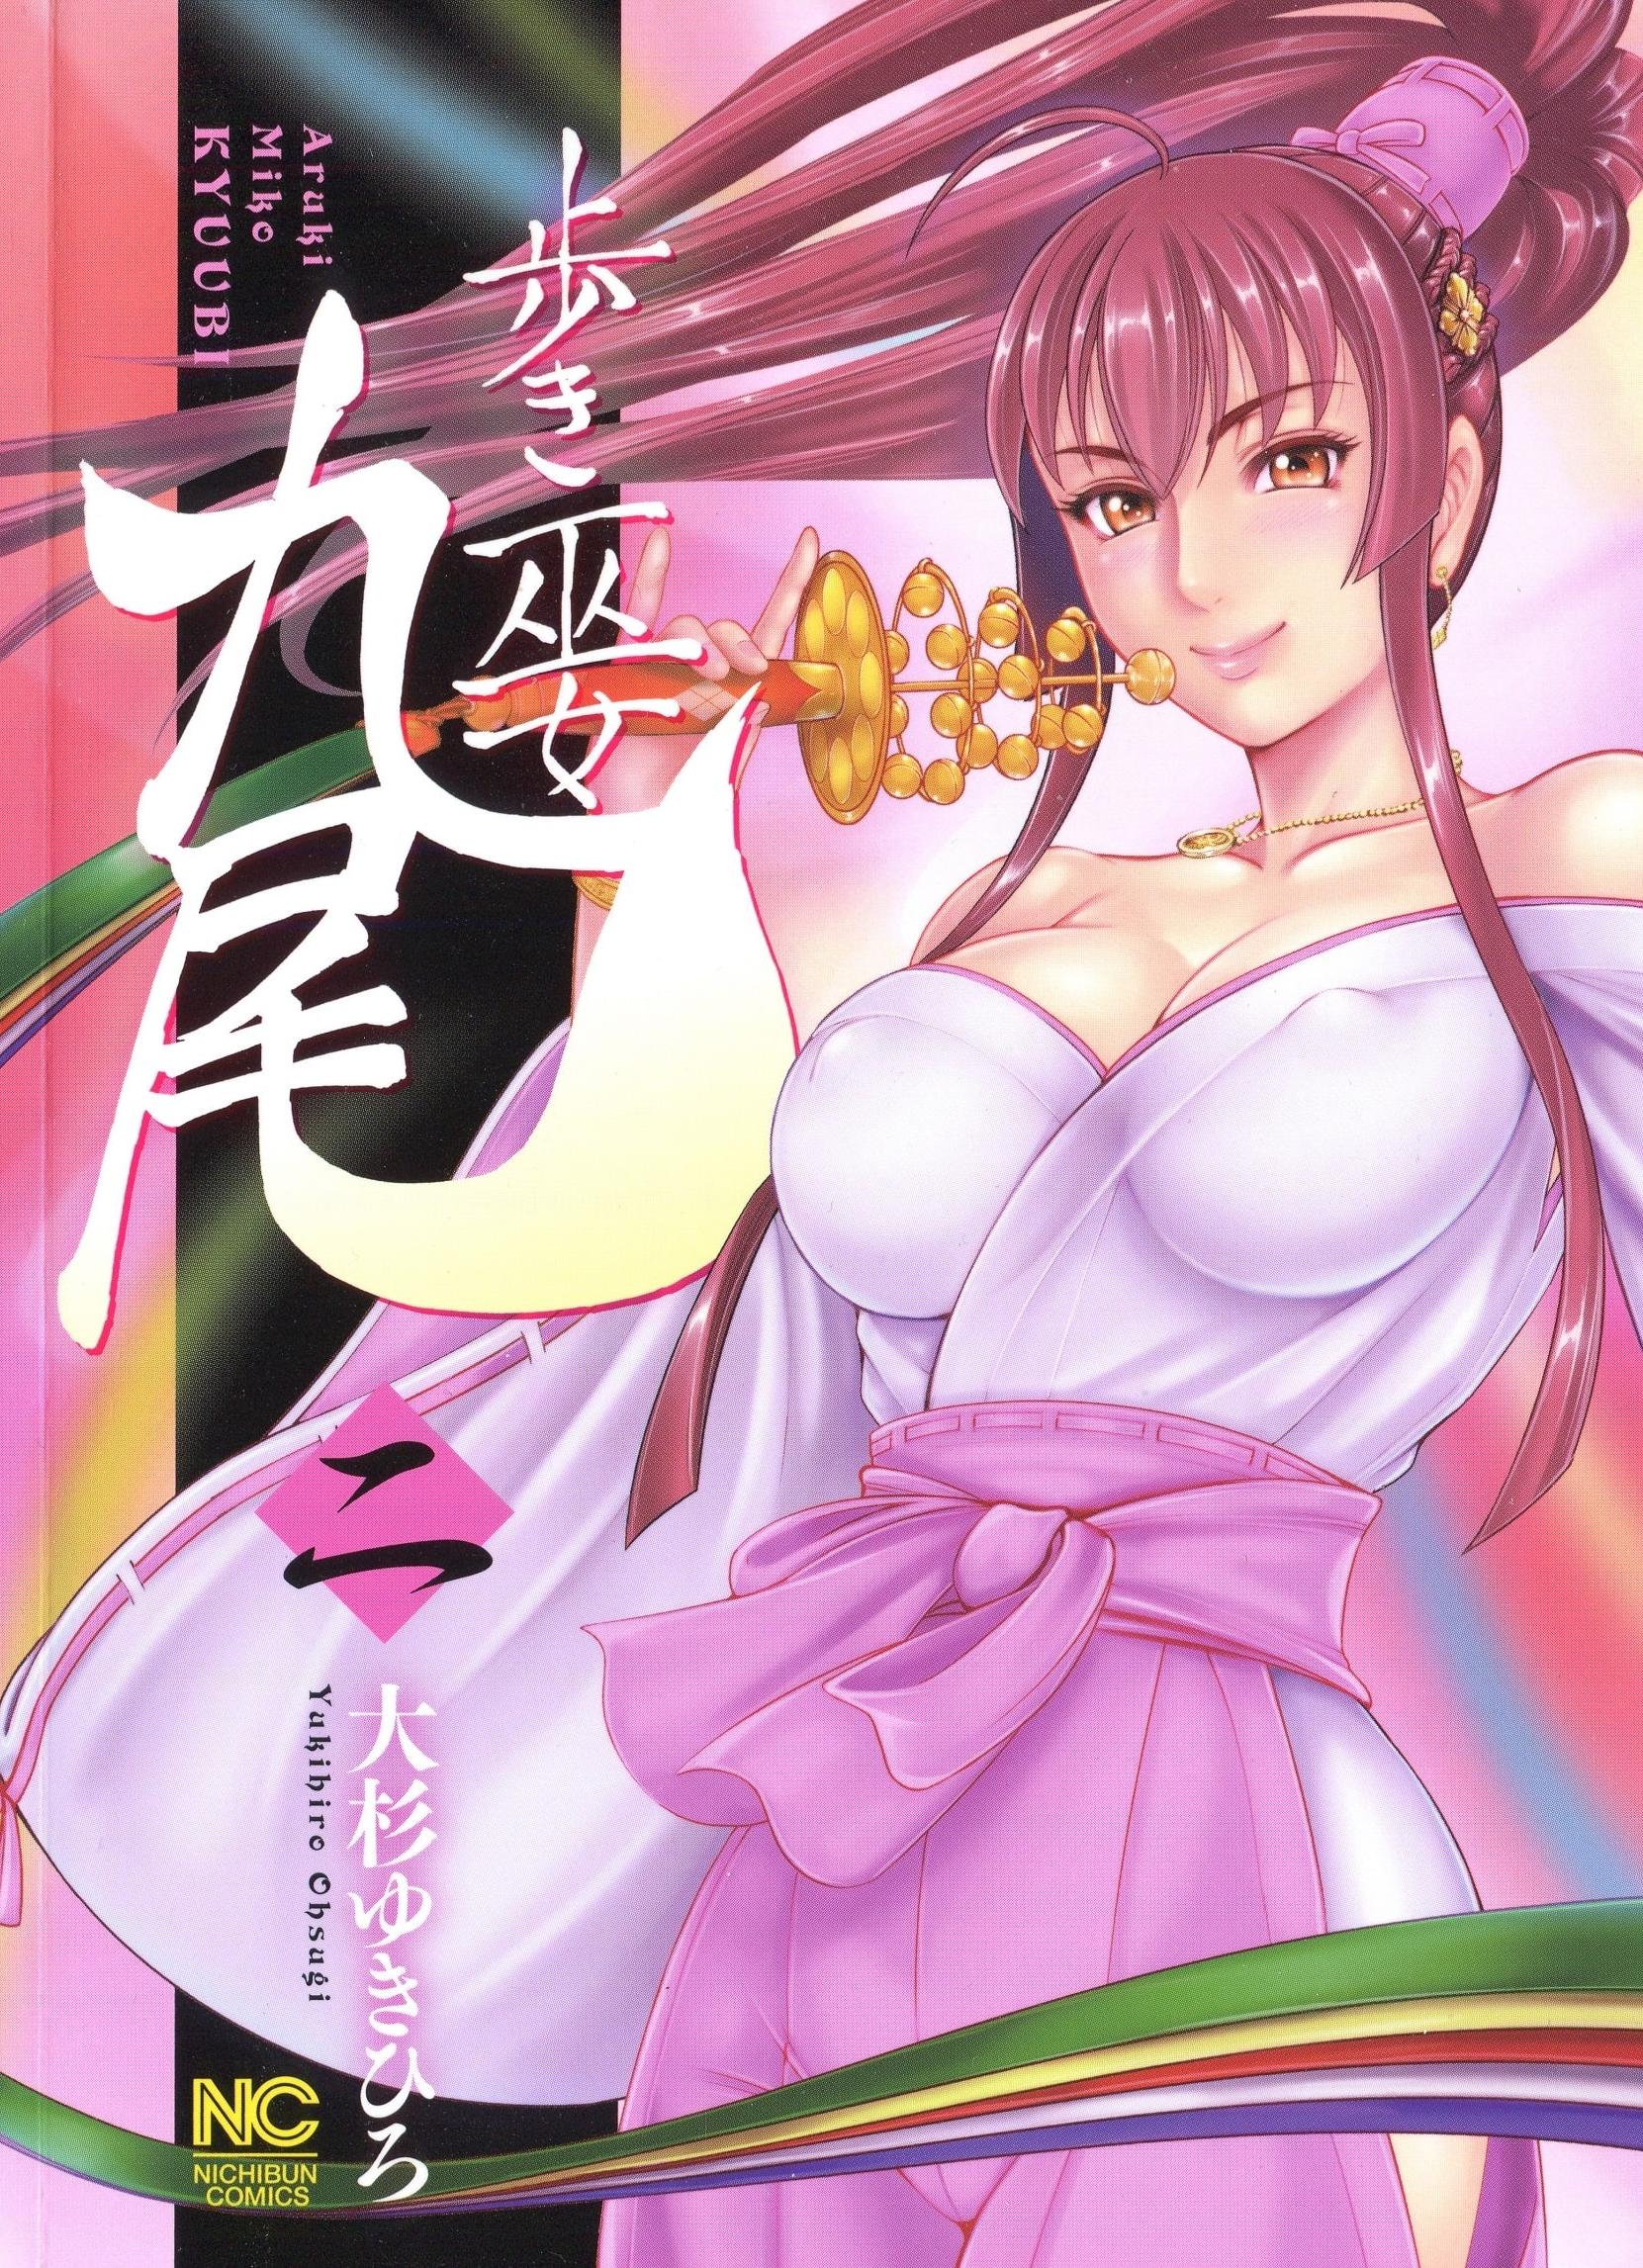 [Yukihiro Oosugi] Aruki Miko Kyuubi Vol.2